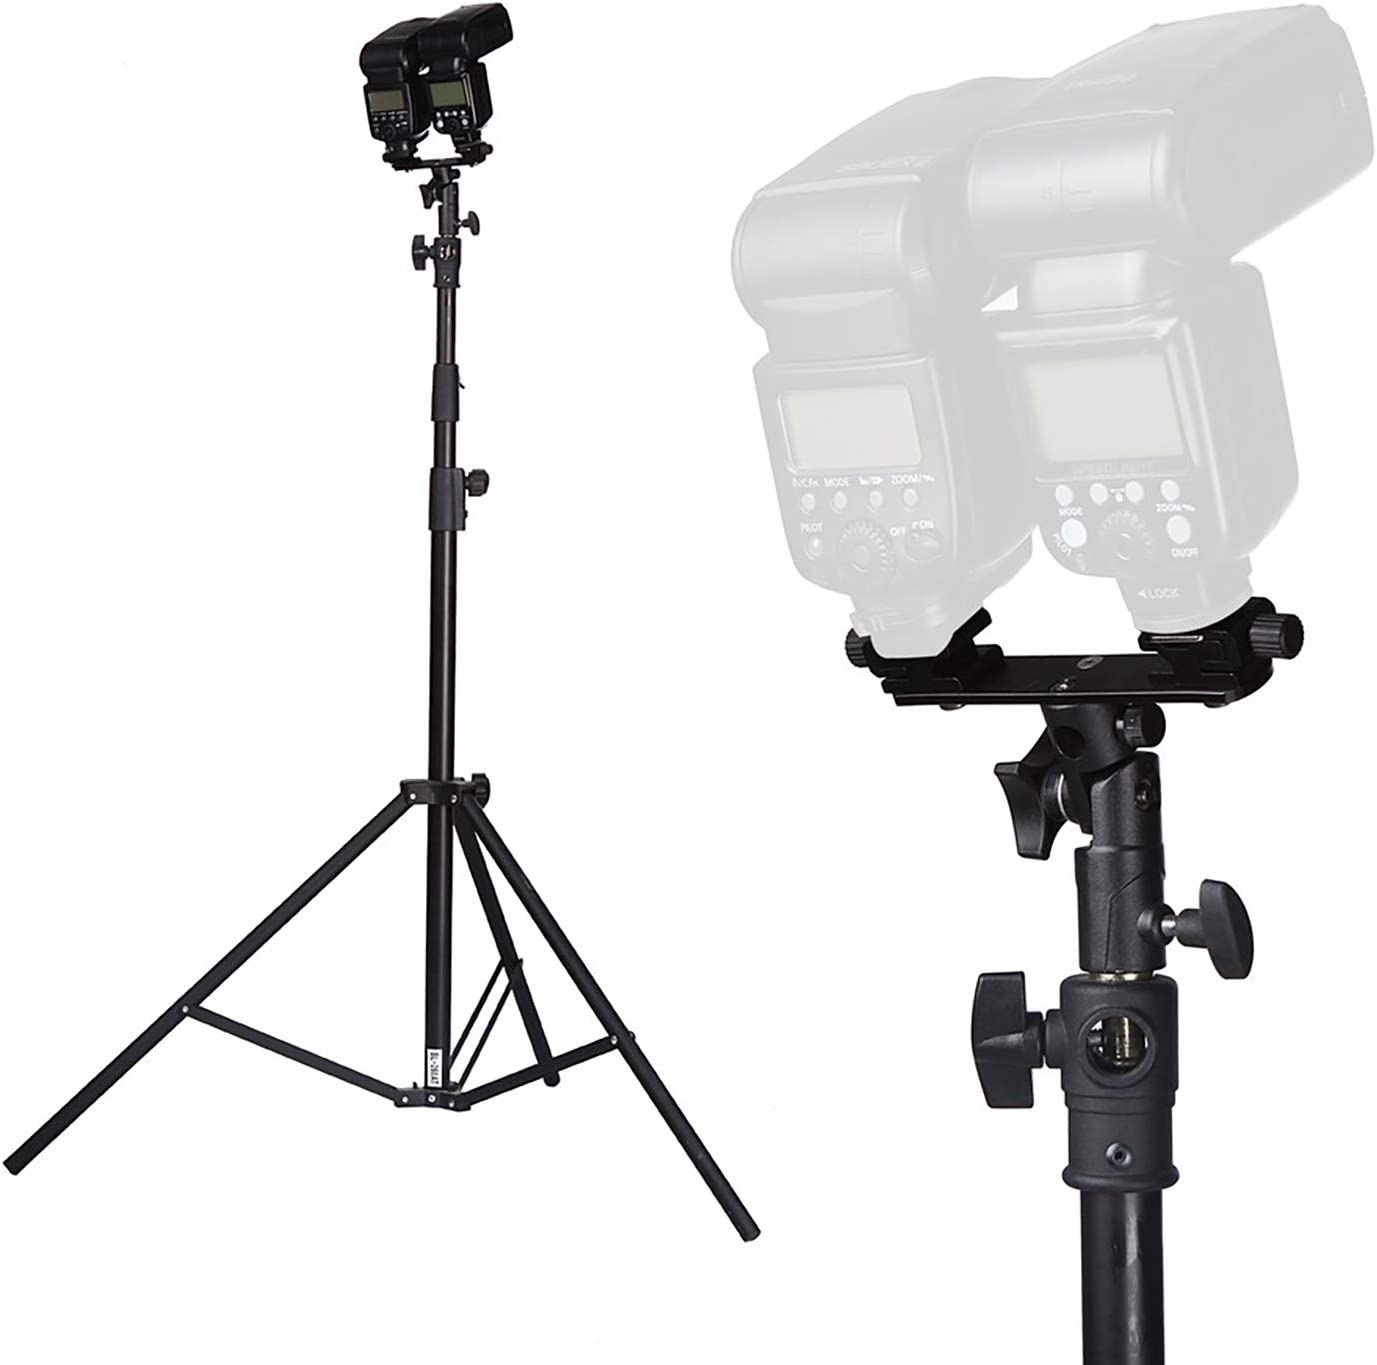 RangerRider Dual Flash Bracket Hot Shoe Speedlight Stand Umbrella Holder with 1//4 to 3//8 Adapter Screw for Studio Video Nikon Yongnuo Flash